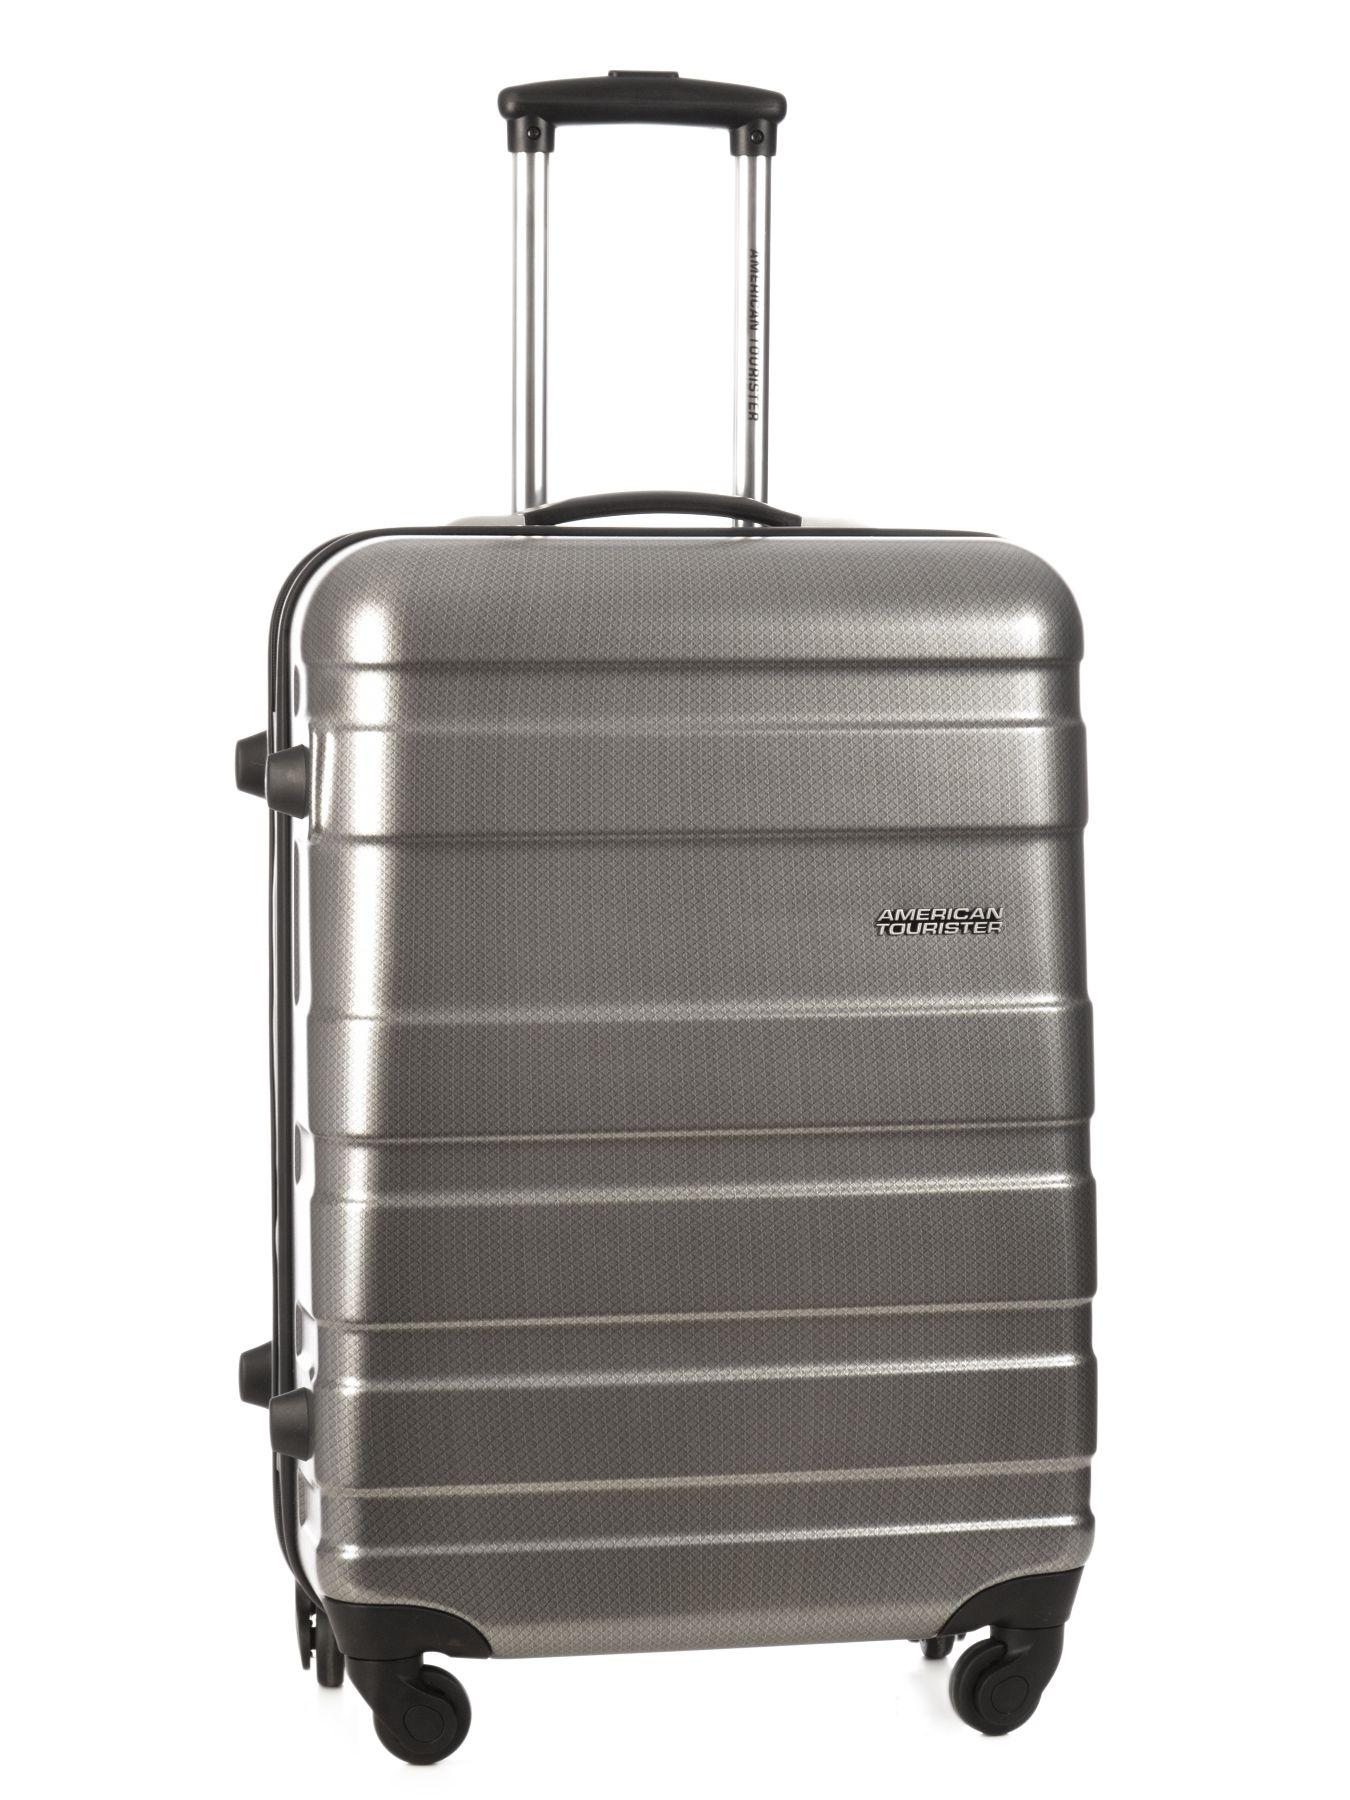 valise rigide american tourister pasadena black silver en vente au meilleur prix. Black Bedroom Furniture Sets. Home Design Ideas